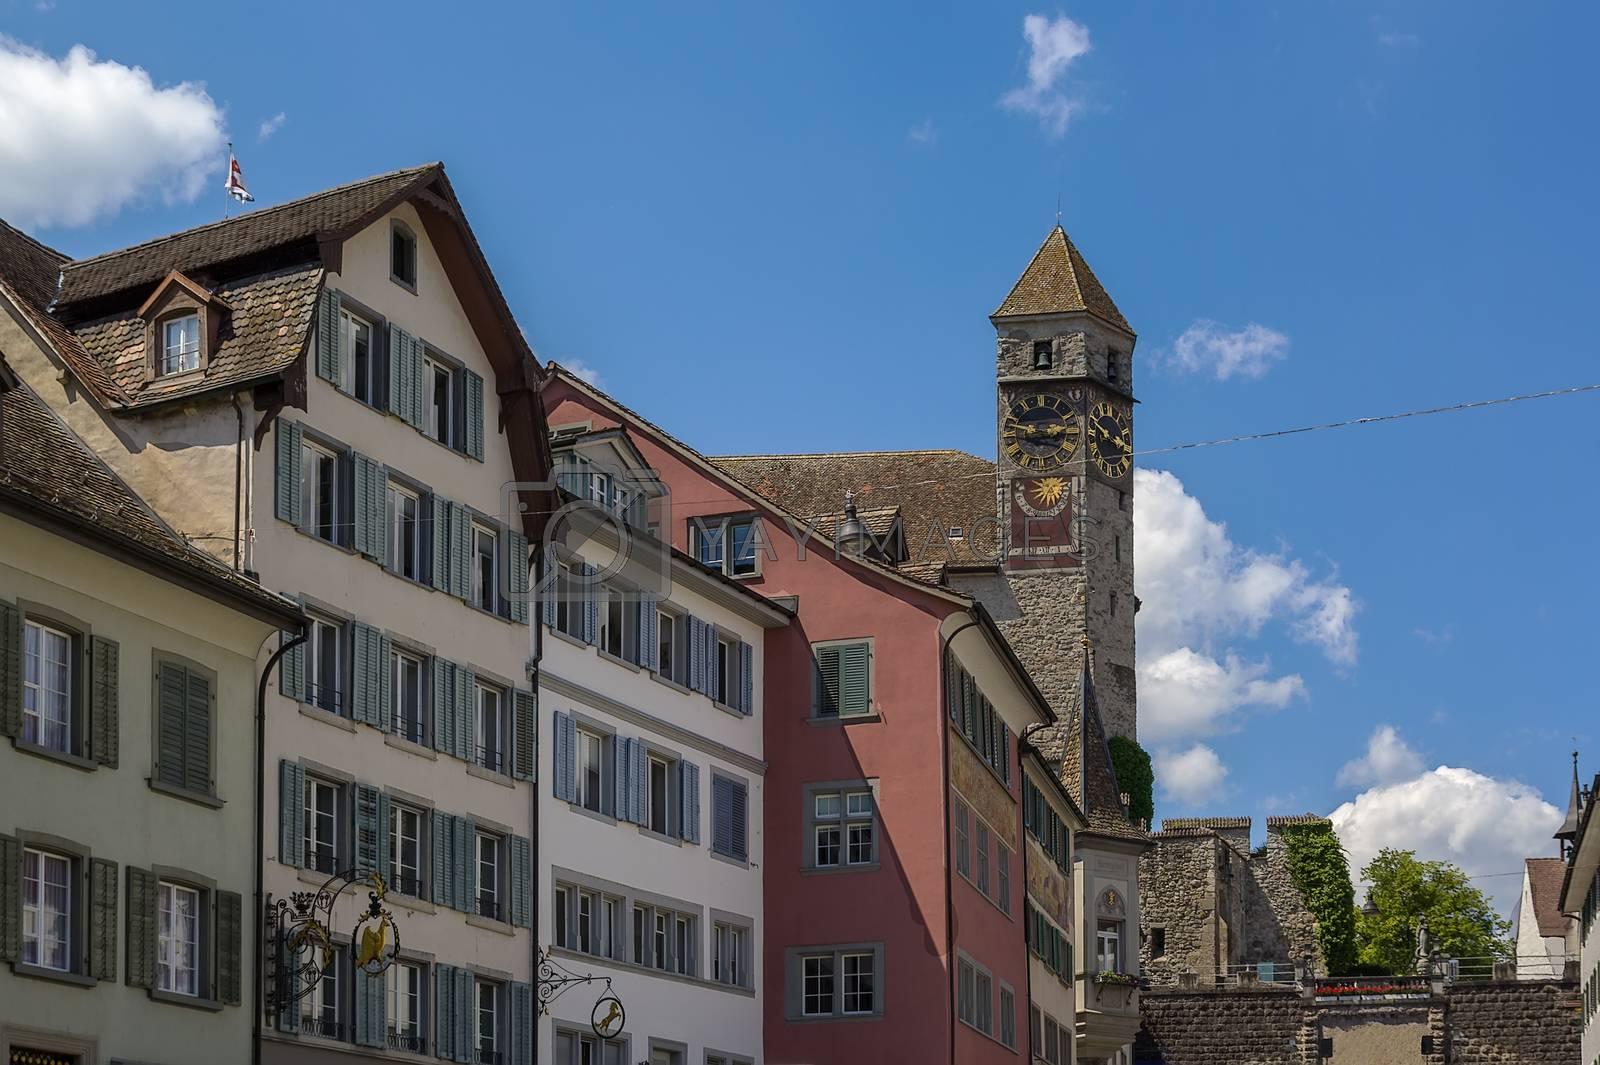 Rapperswil, Switzerland by borisb17